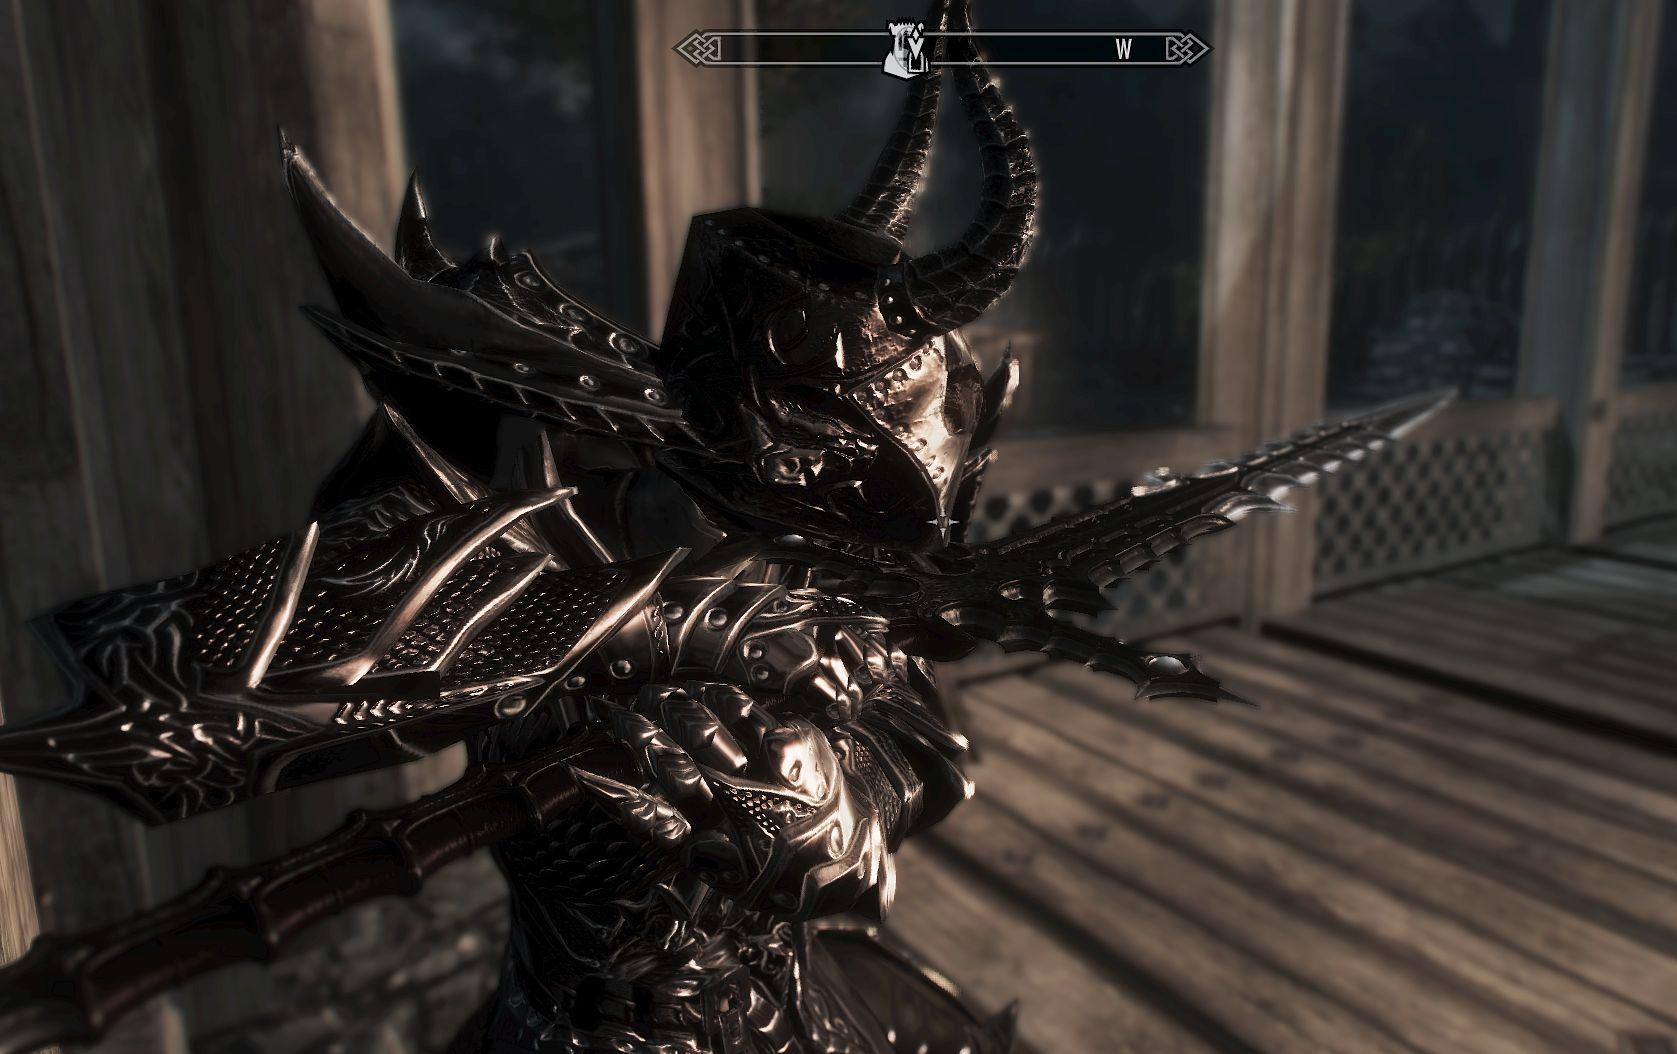 9.jpg - Elder Scrolls 5: Skyrim, the